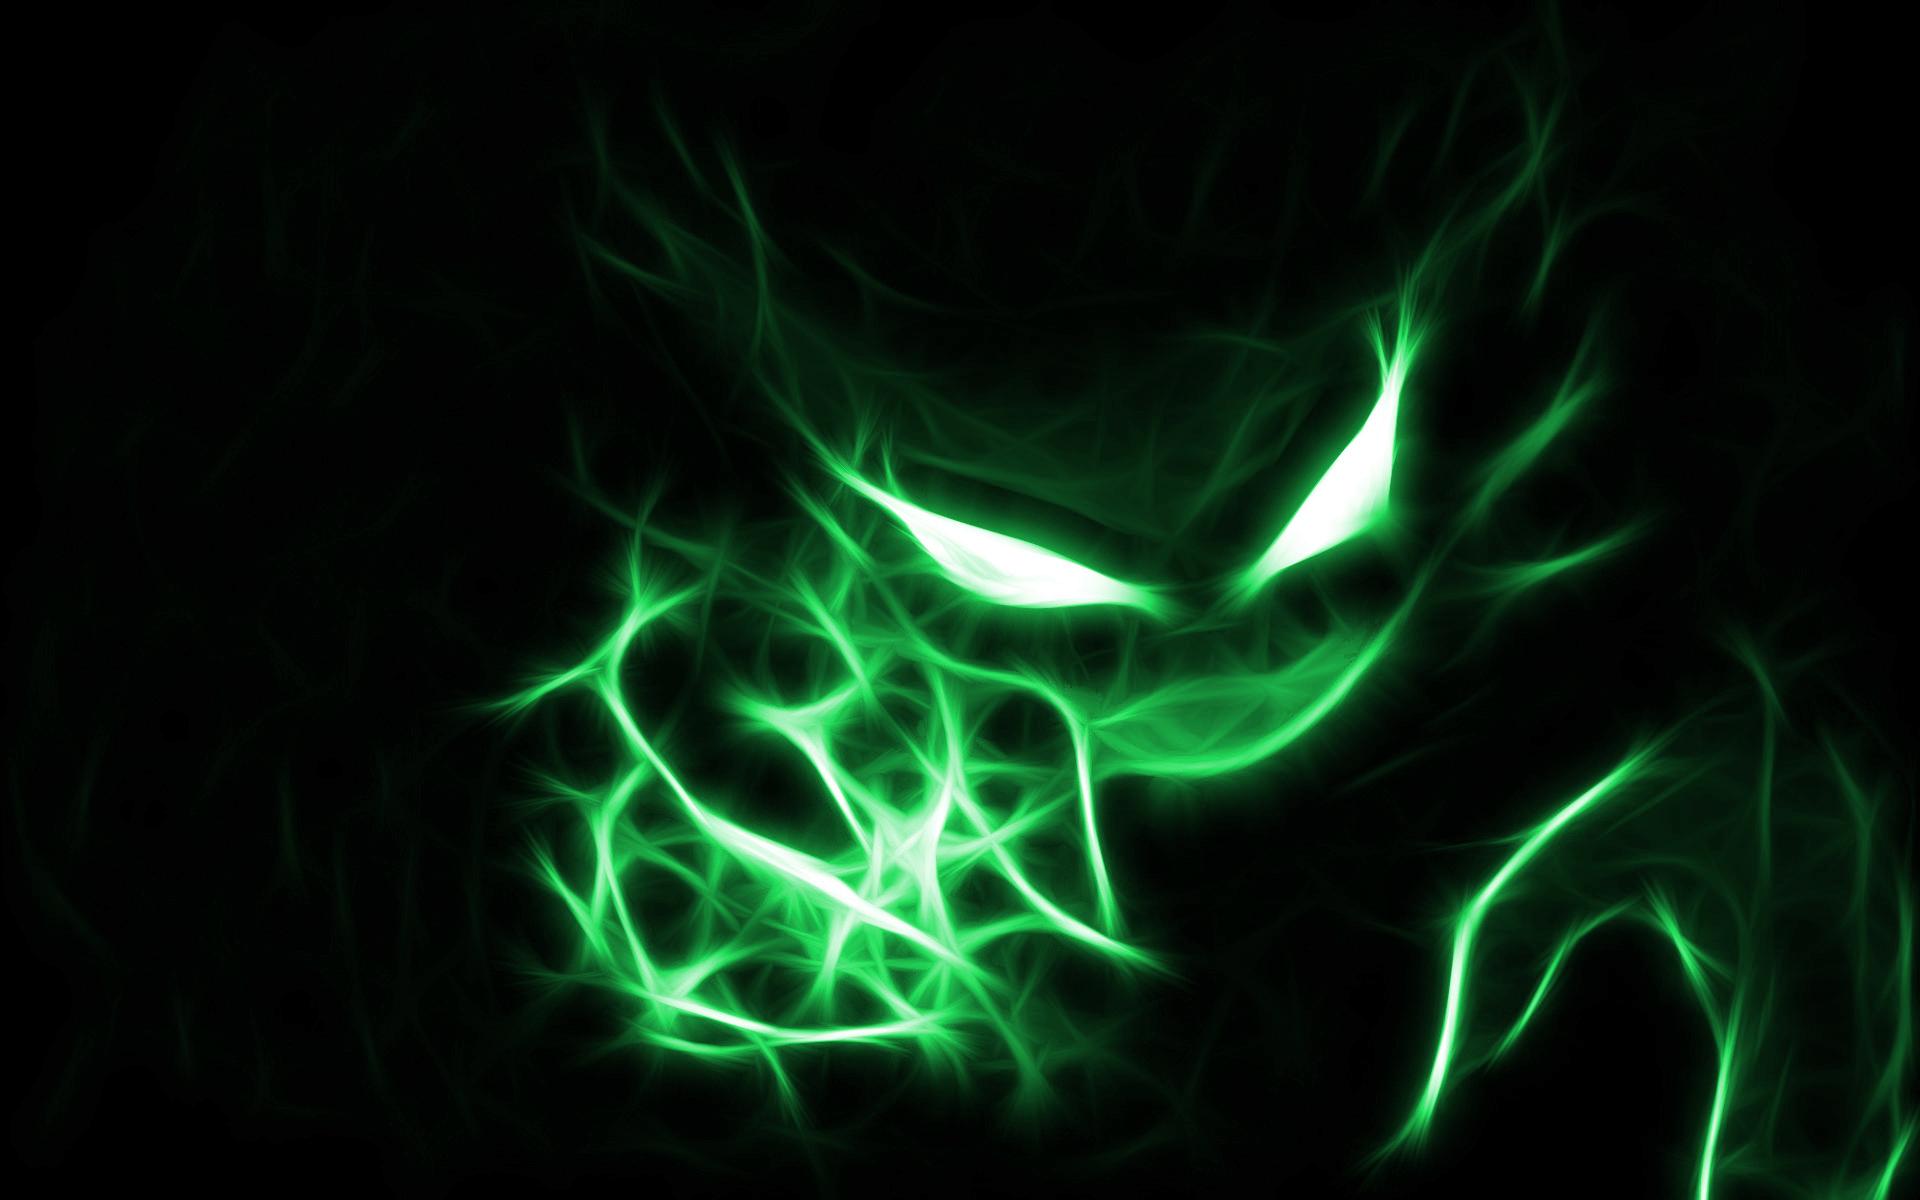 Hd Quality Weed Smoke Cool Wallpaper Neon Pokemon 182195